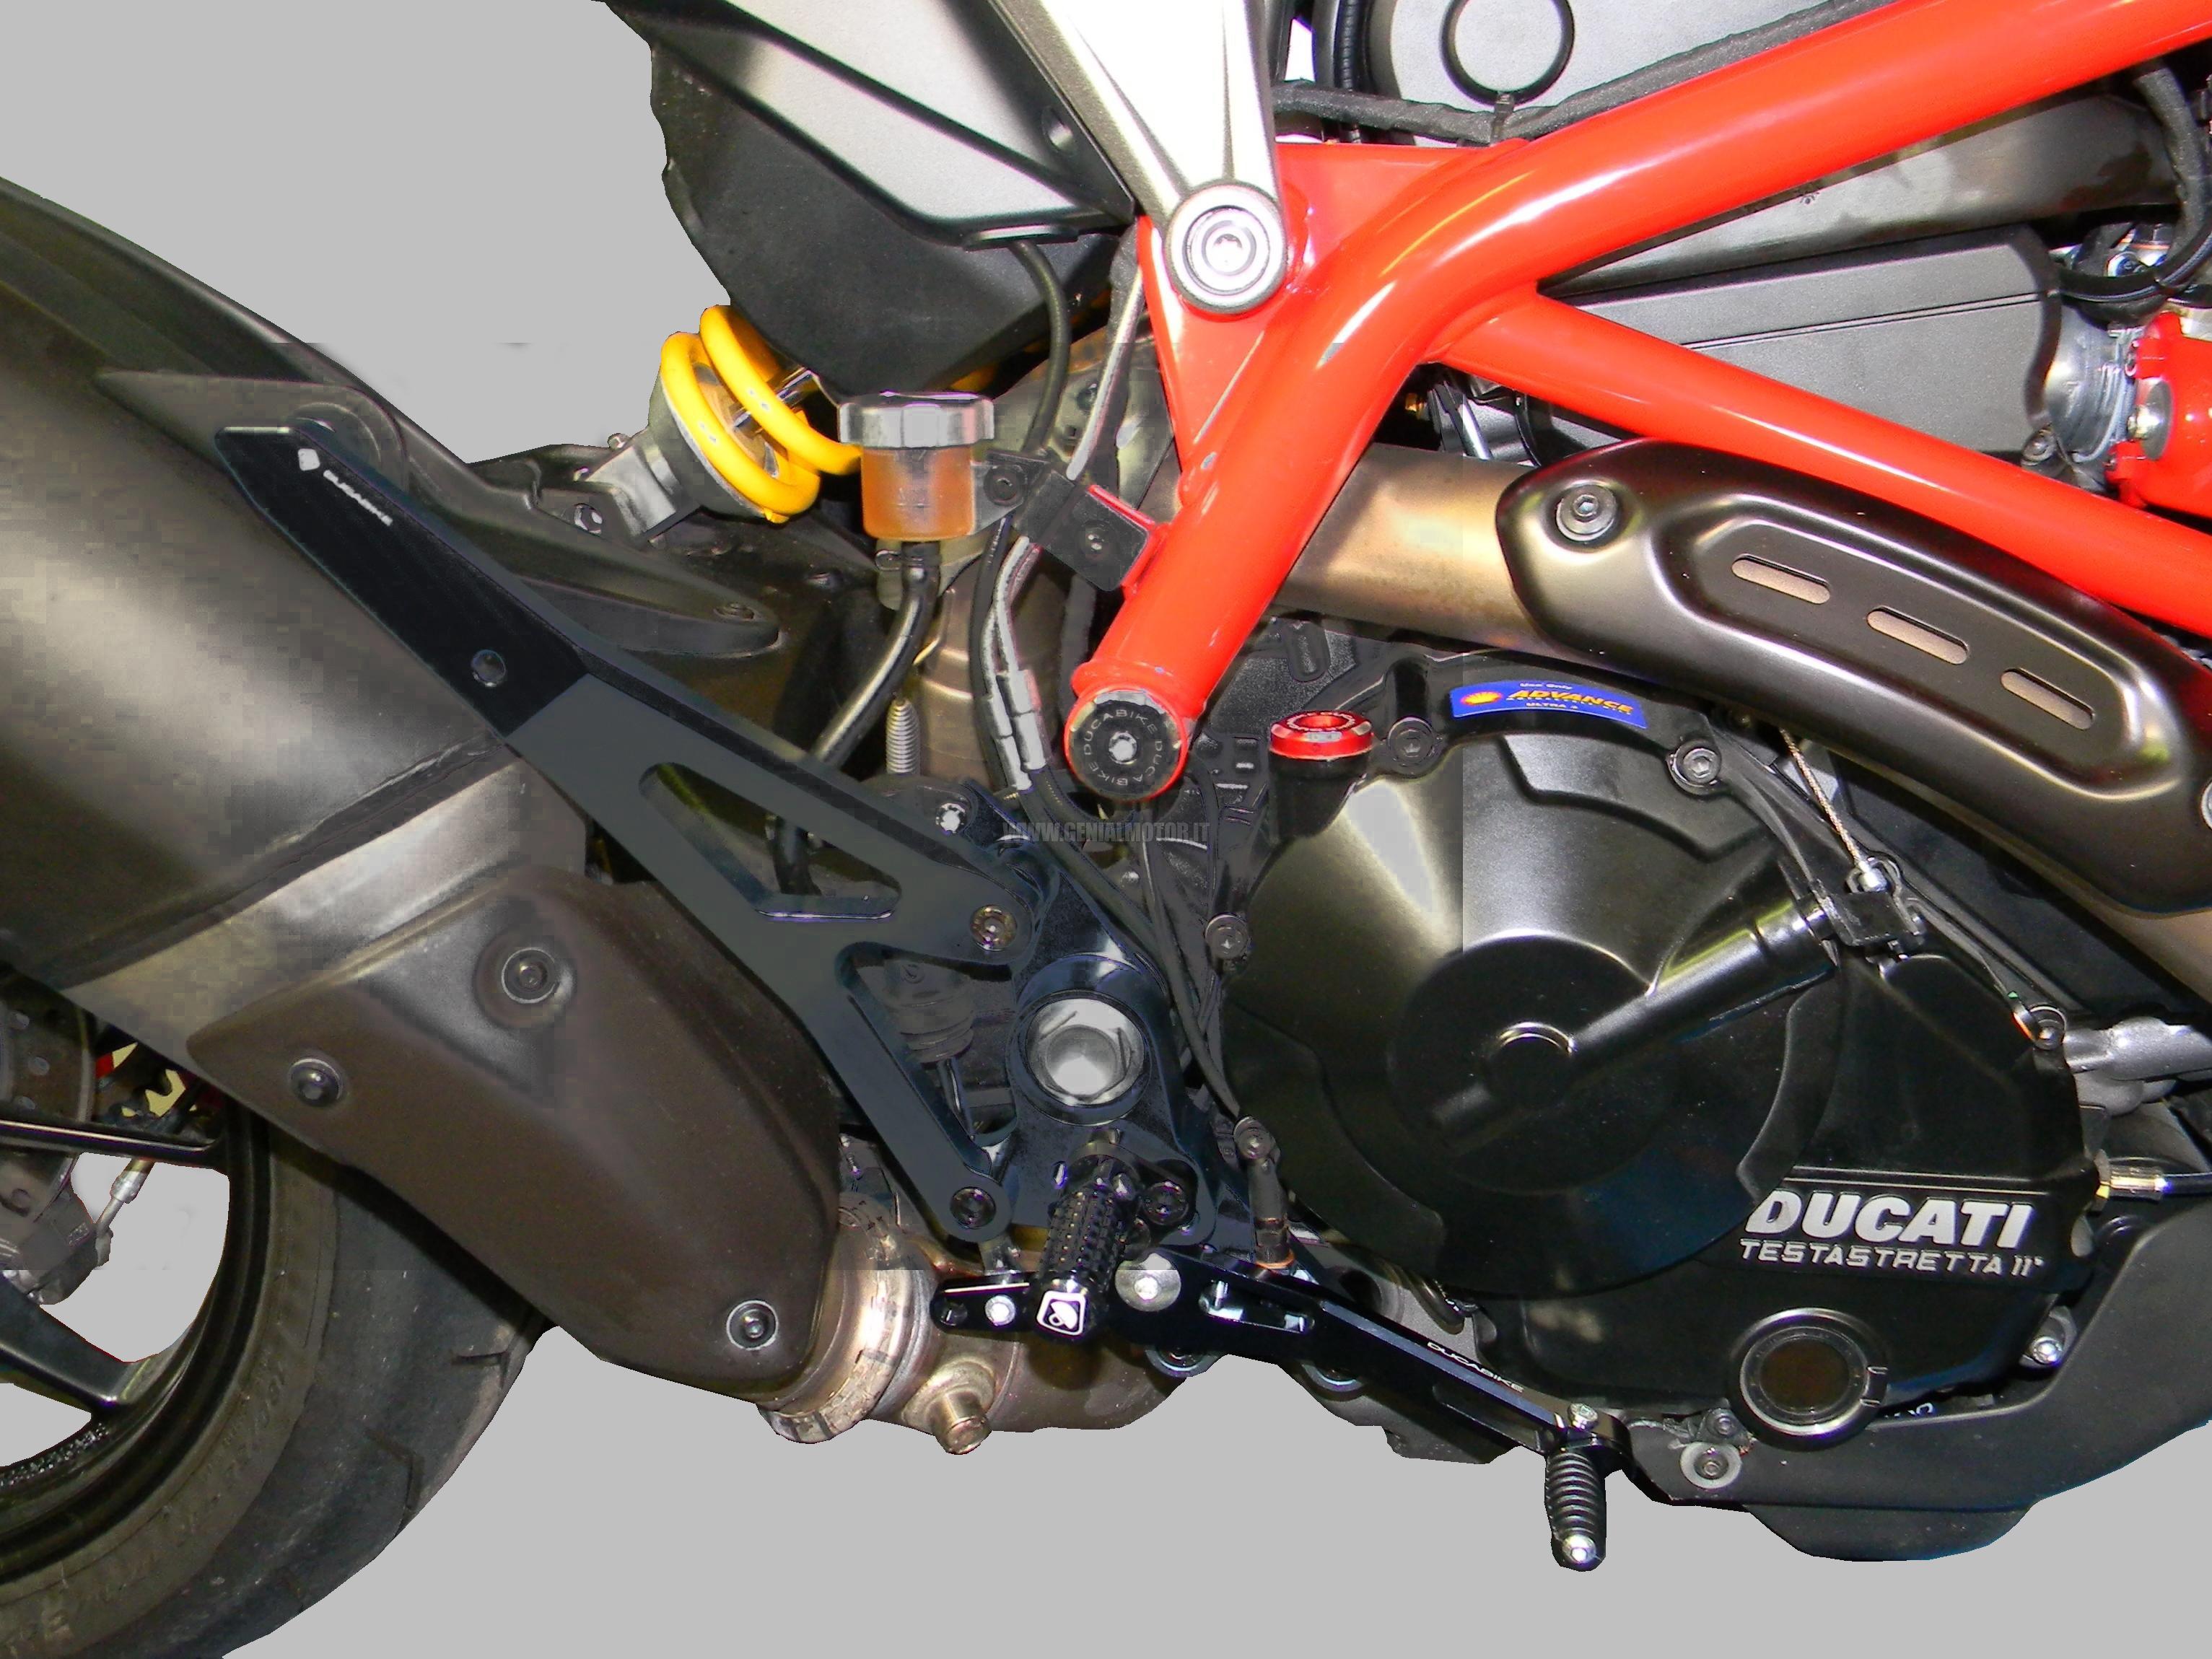 PRNHM01DD Ducabike Prnhm01dd Pedane Hypermotard 821 Nero - Nero